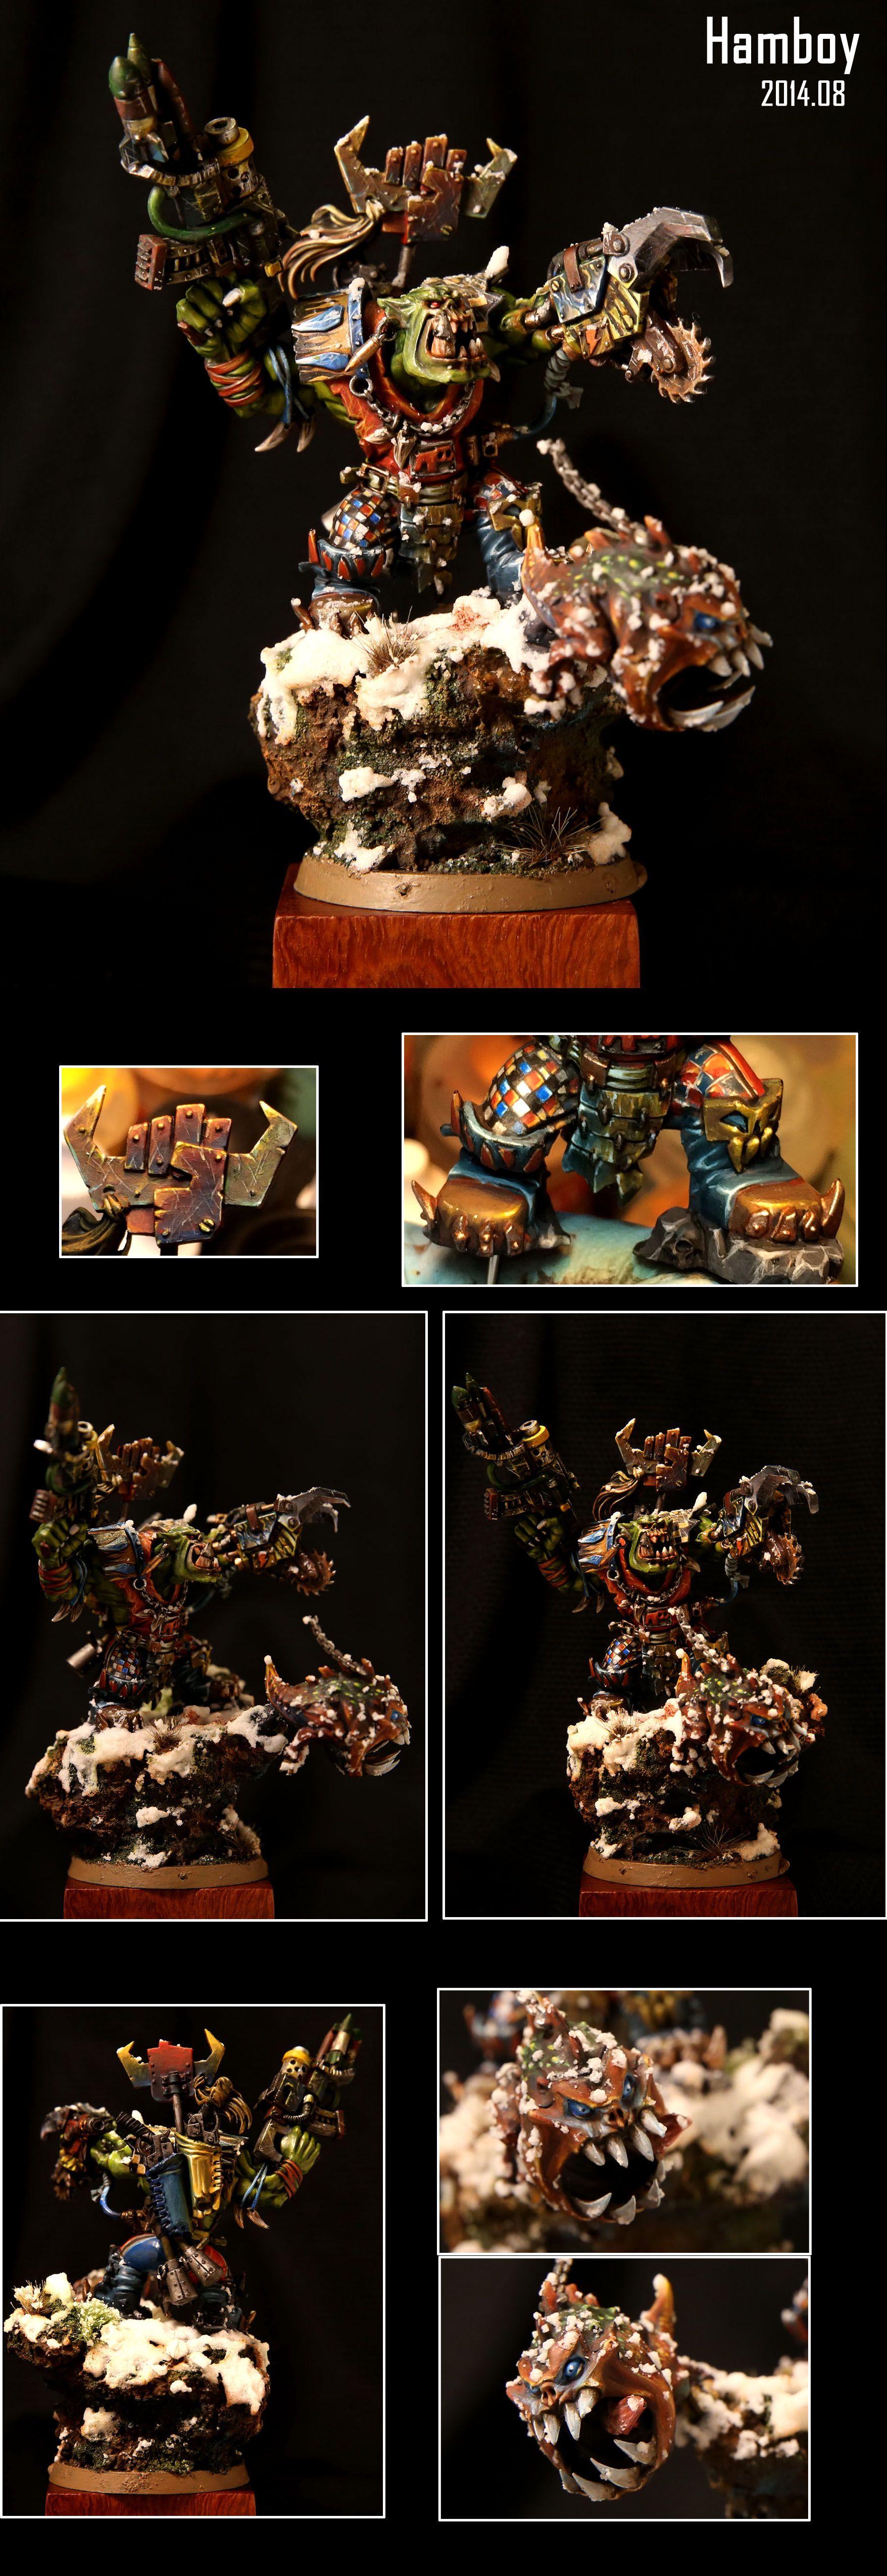 Ork Warboss (Stormclaw), Grukk